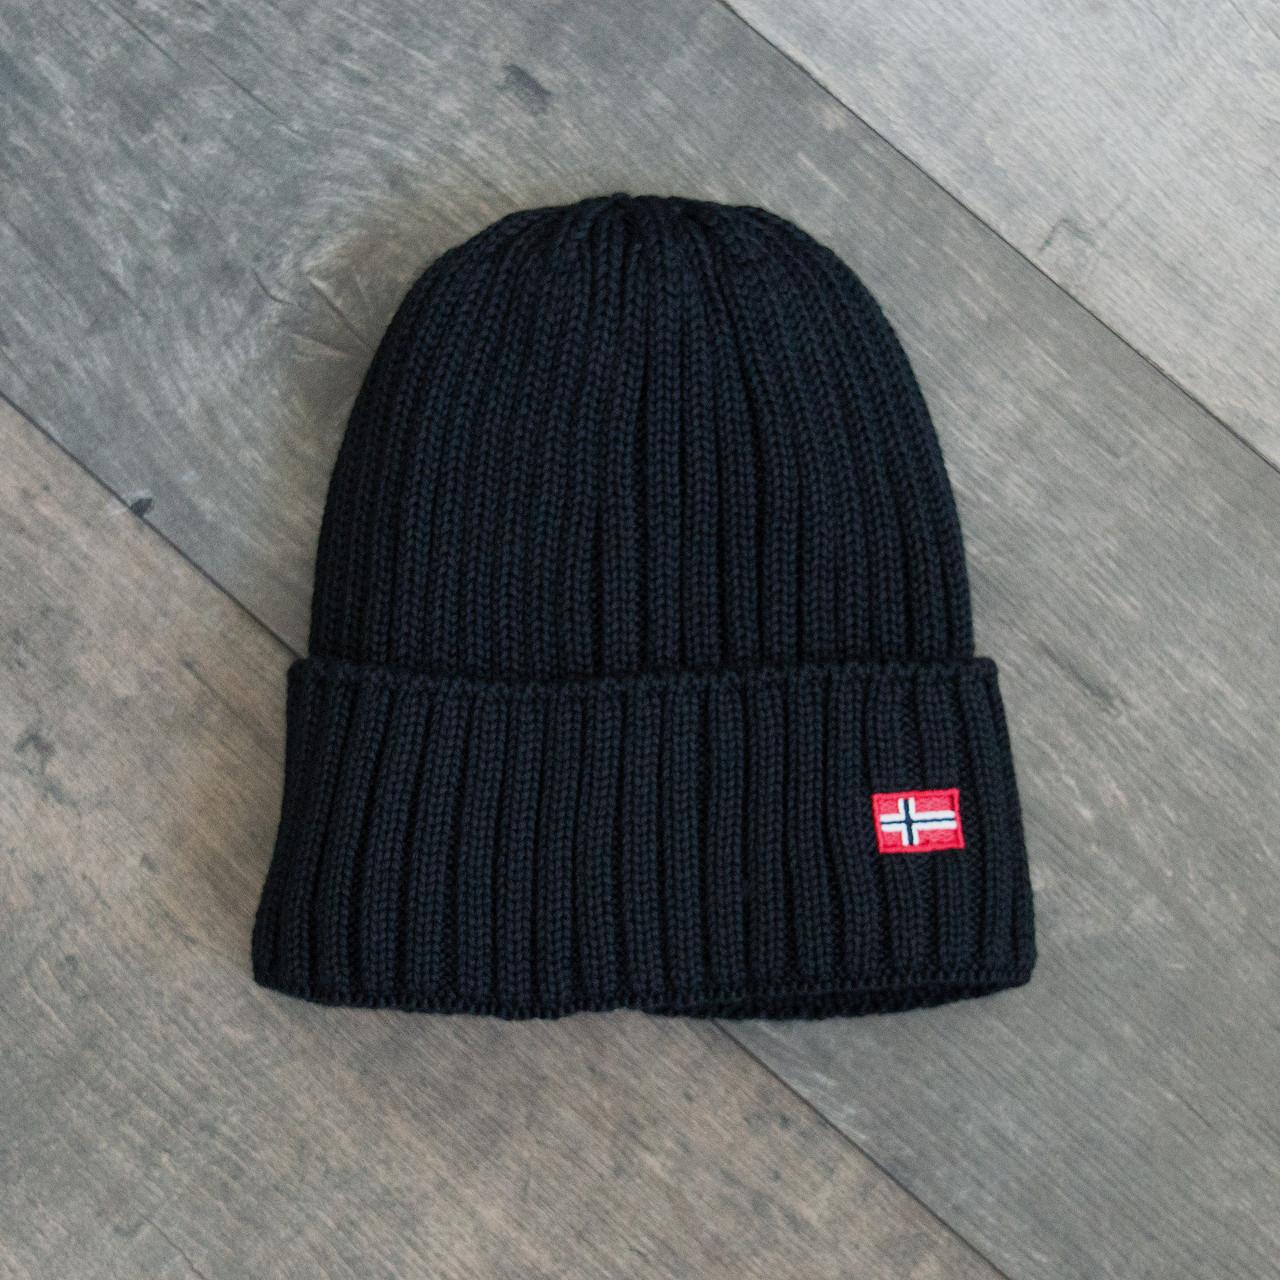 Зимняя шапка черная унисекс Napapijri